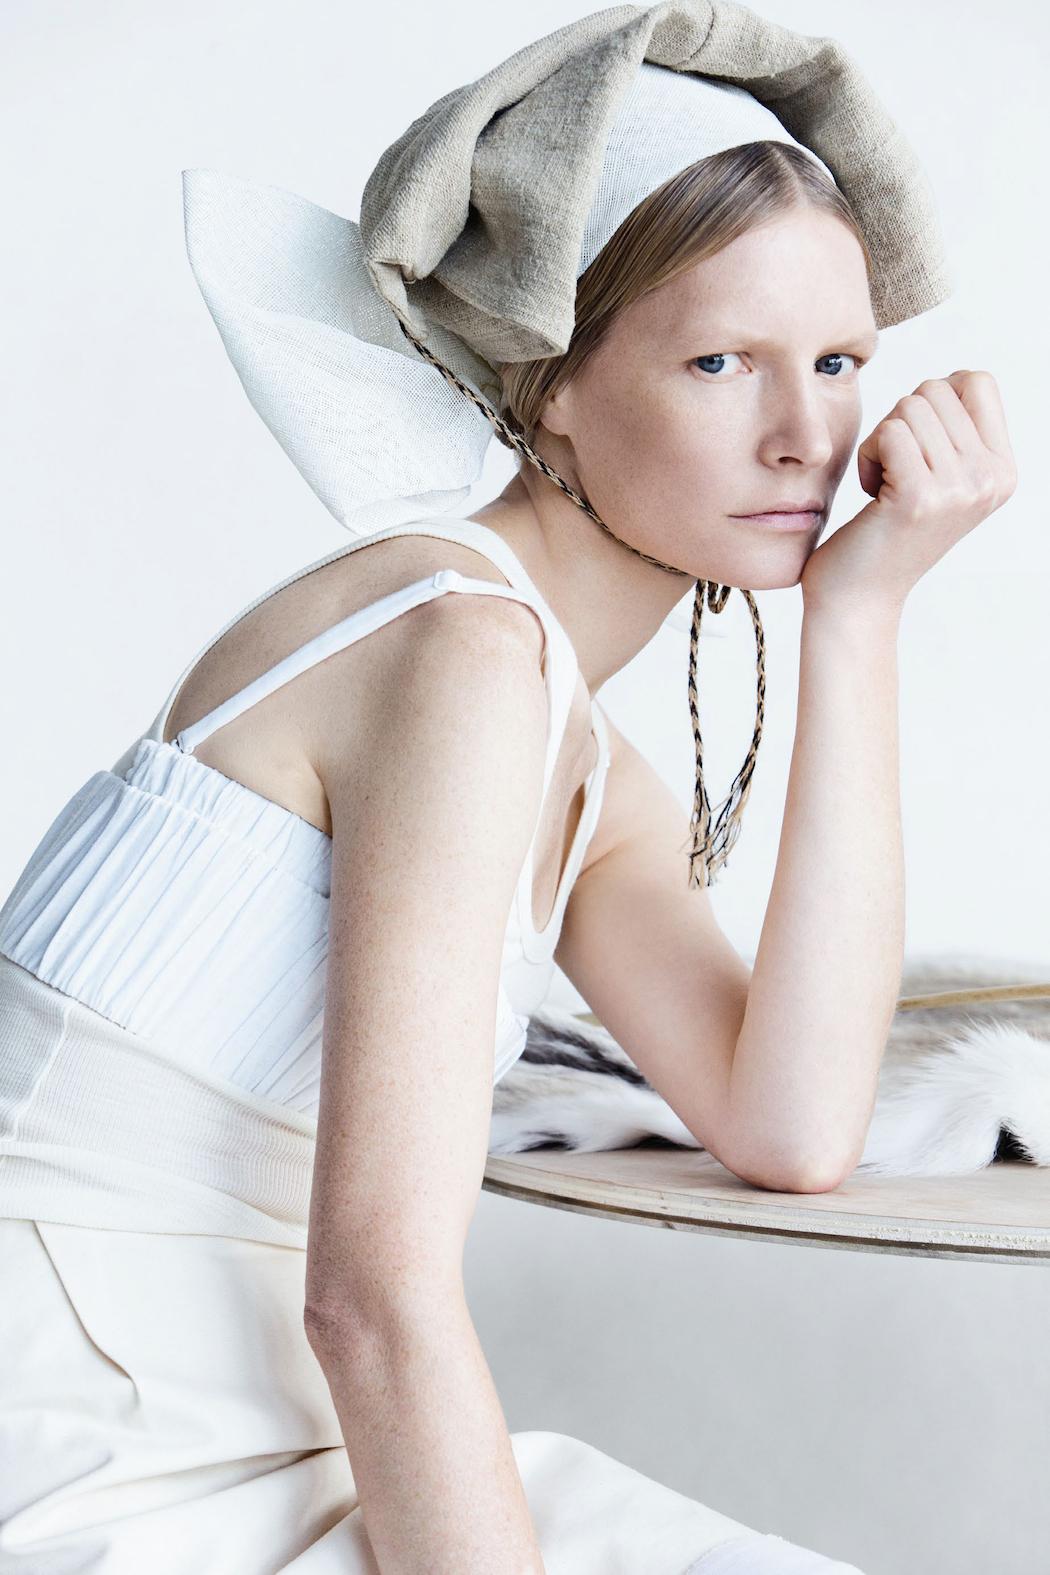 Vogue-UK-February-2015-Clean-Slate-Photographer-Patrick-Demarchelier-Stylist-Lucinda-Chambers-1.jpg